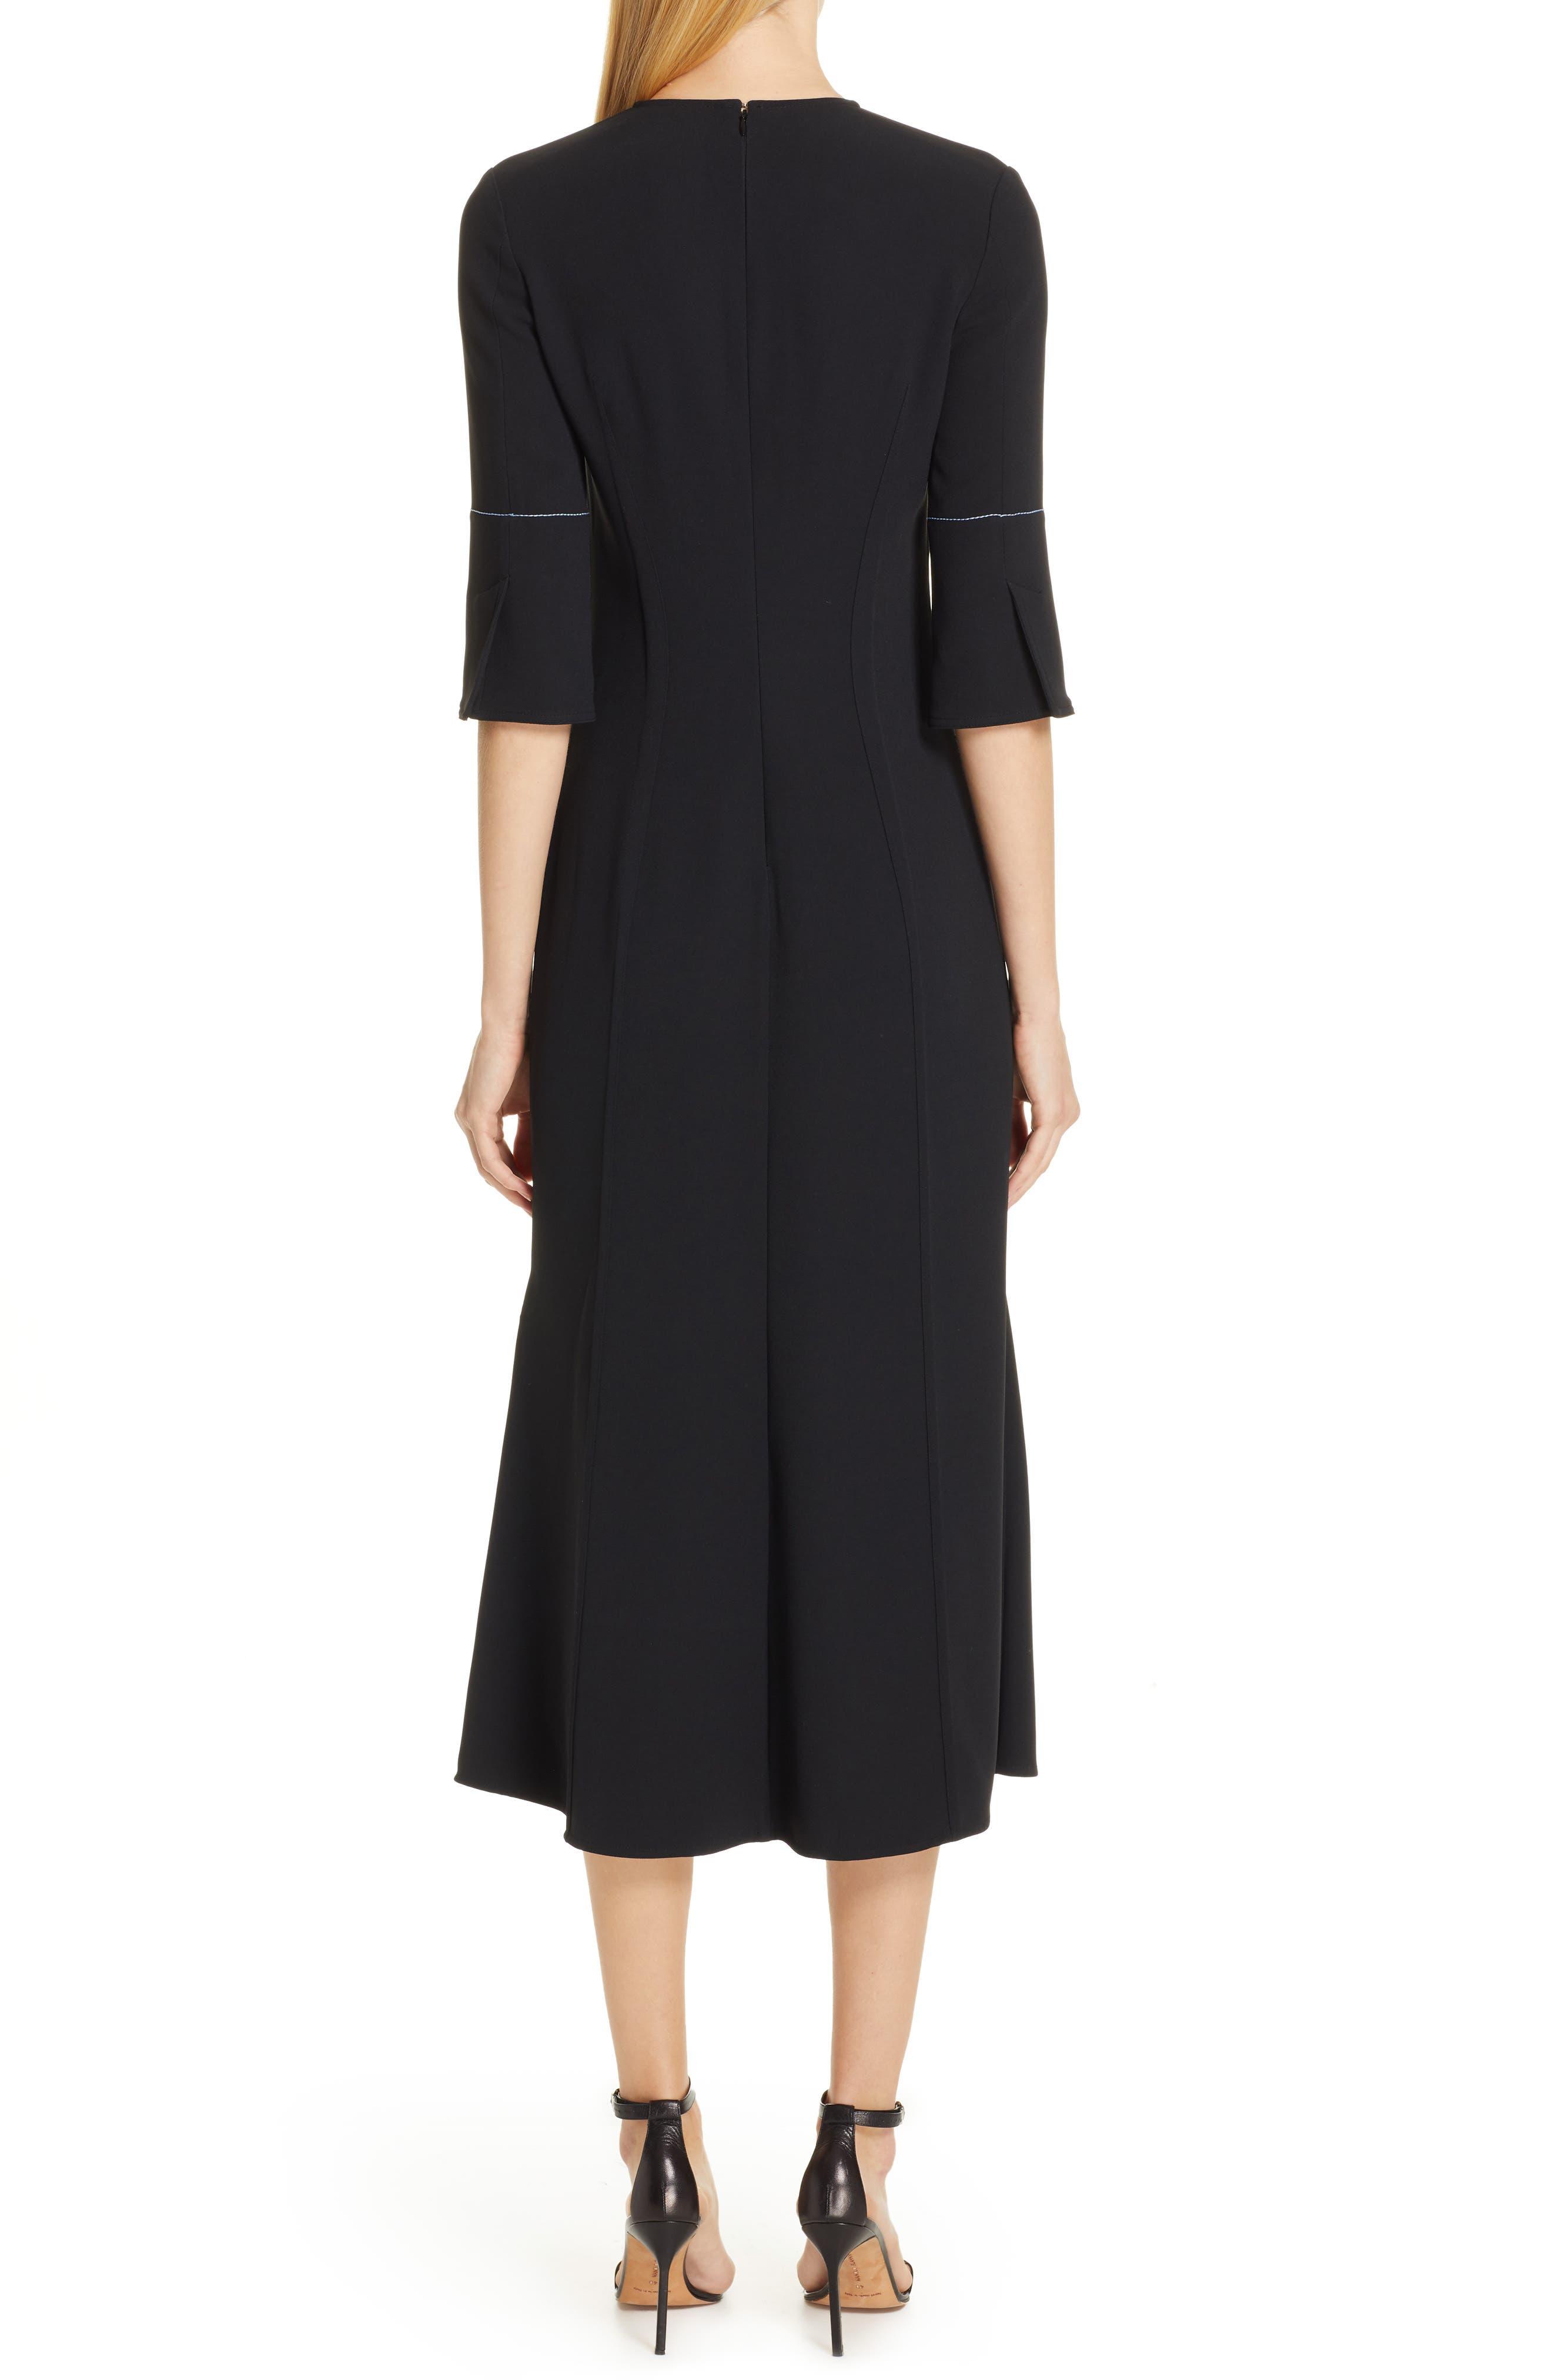 VICTORIA BECKHAM, Contrast Stitch Crepe Dress, Alternate thumbnail 2, color, BLACK